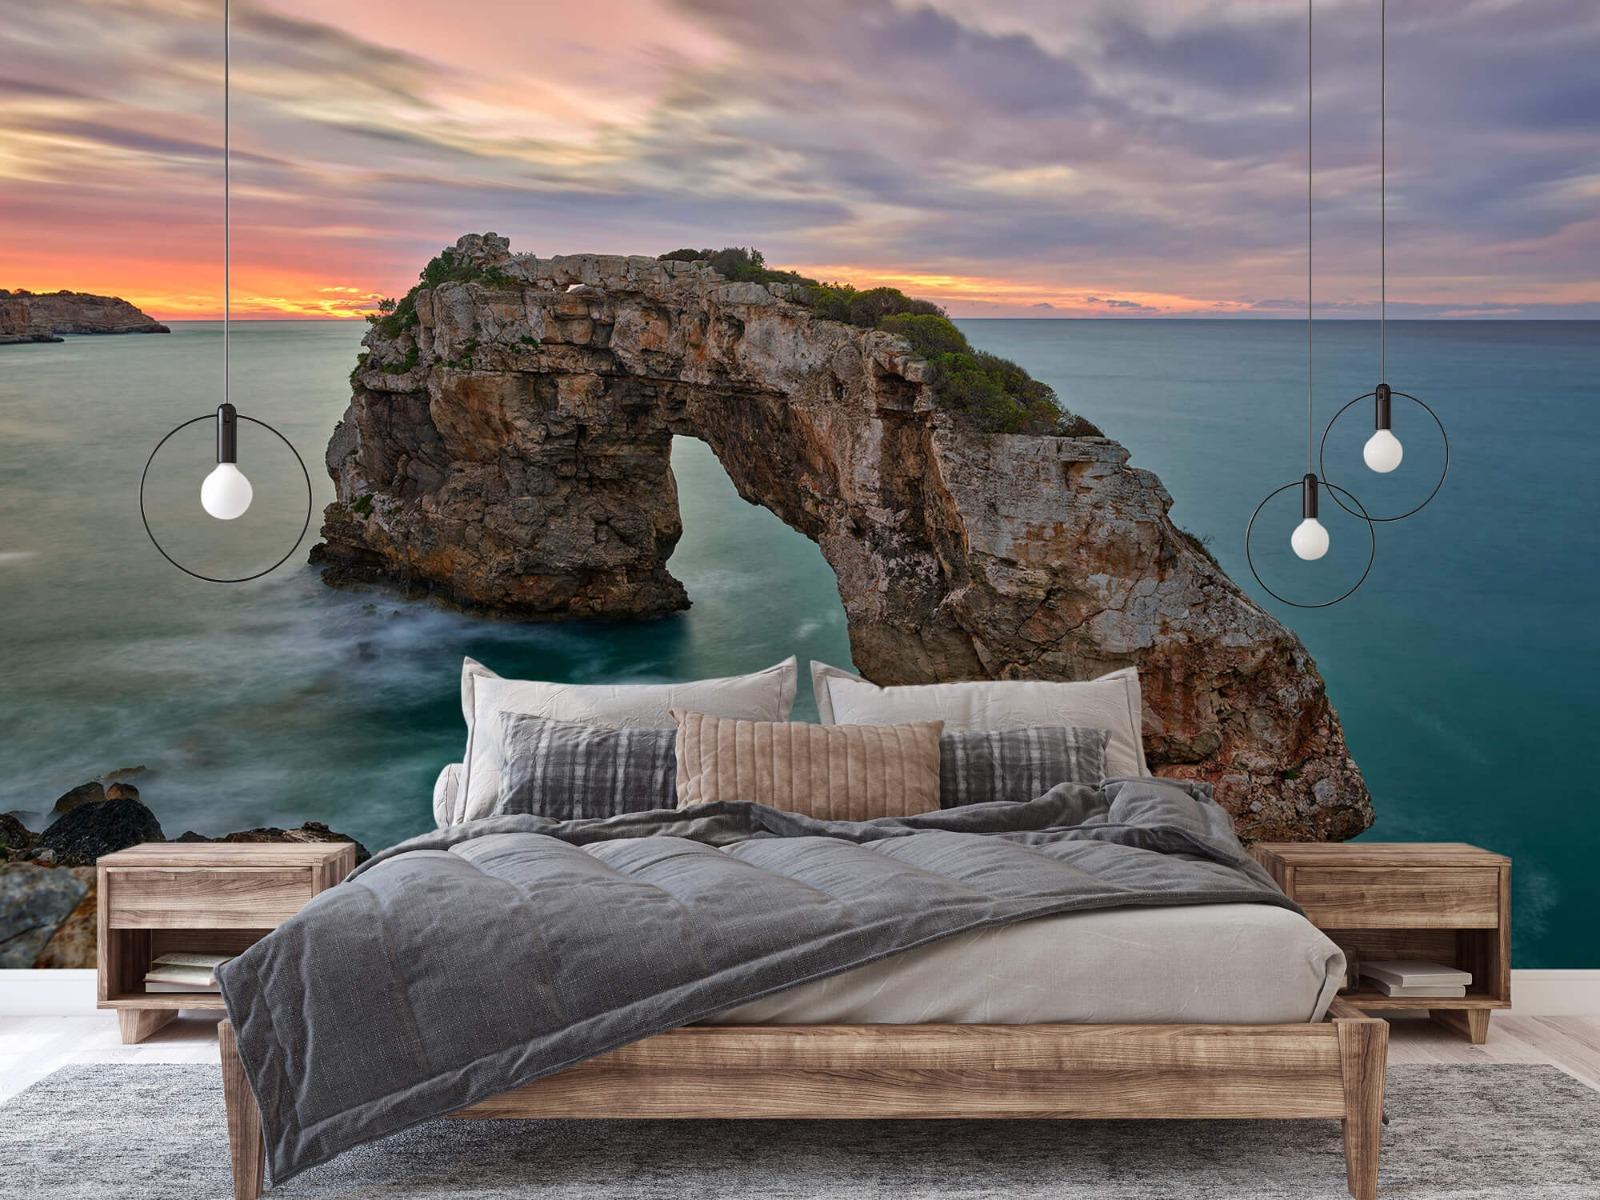 Zeeën en Oceanen - Rots in zee - Slaapkamer 2